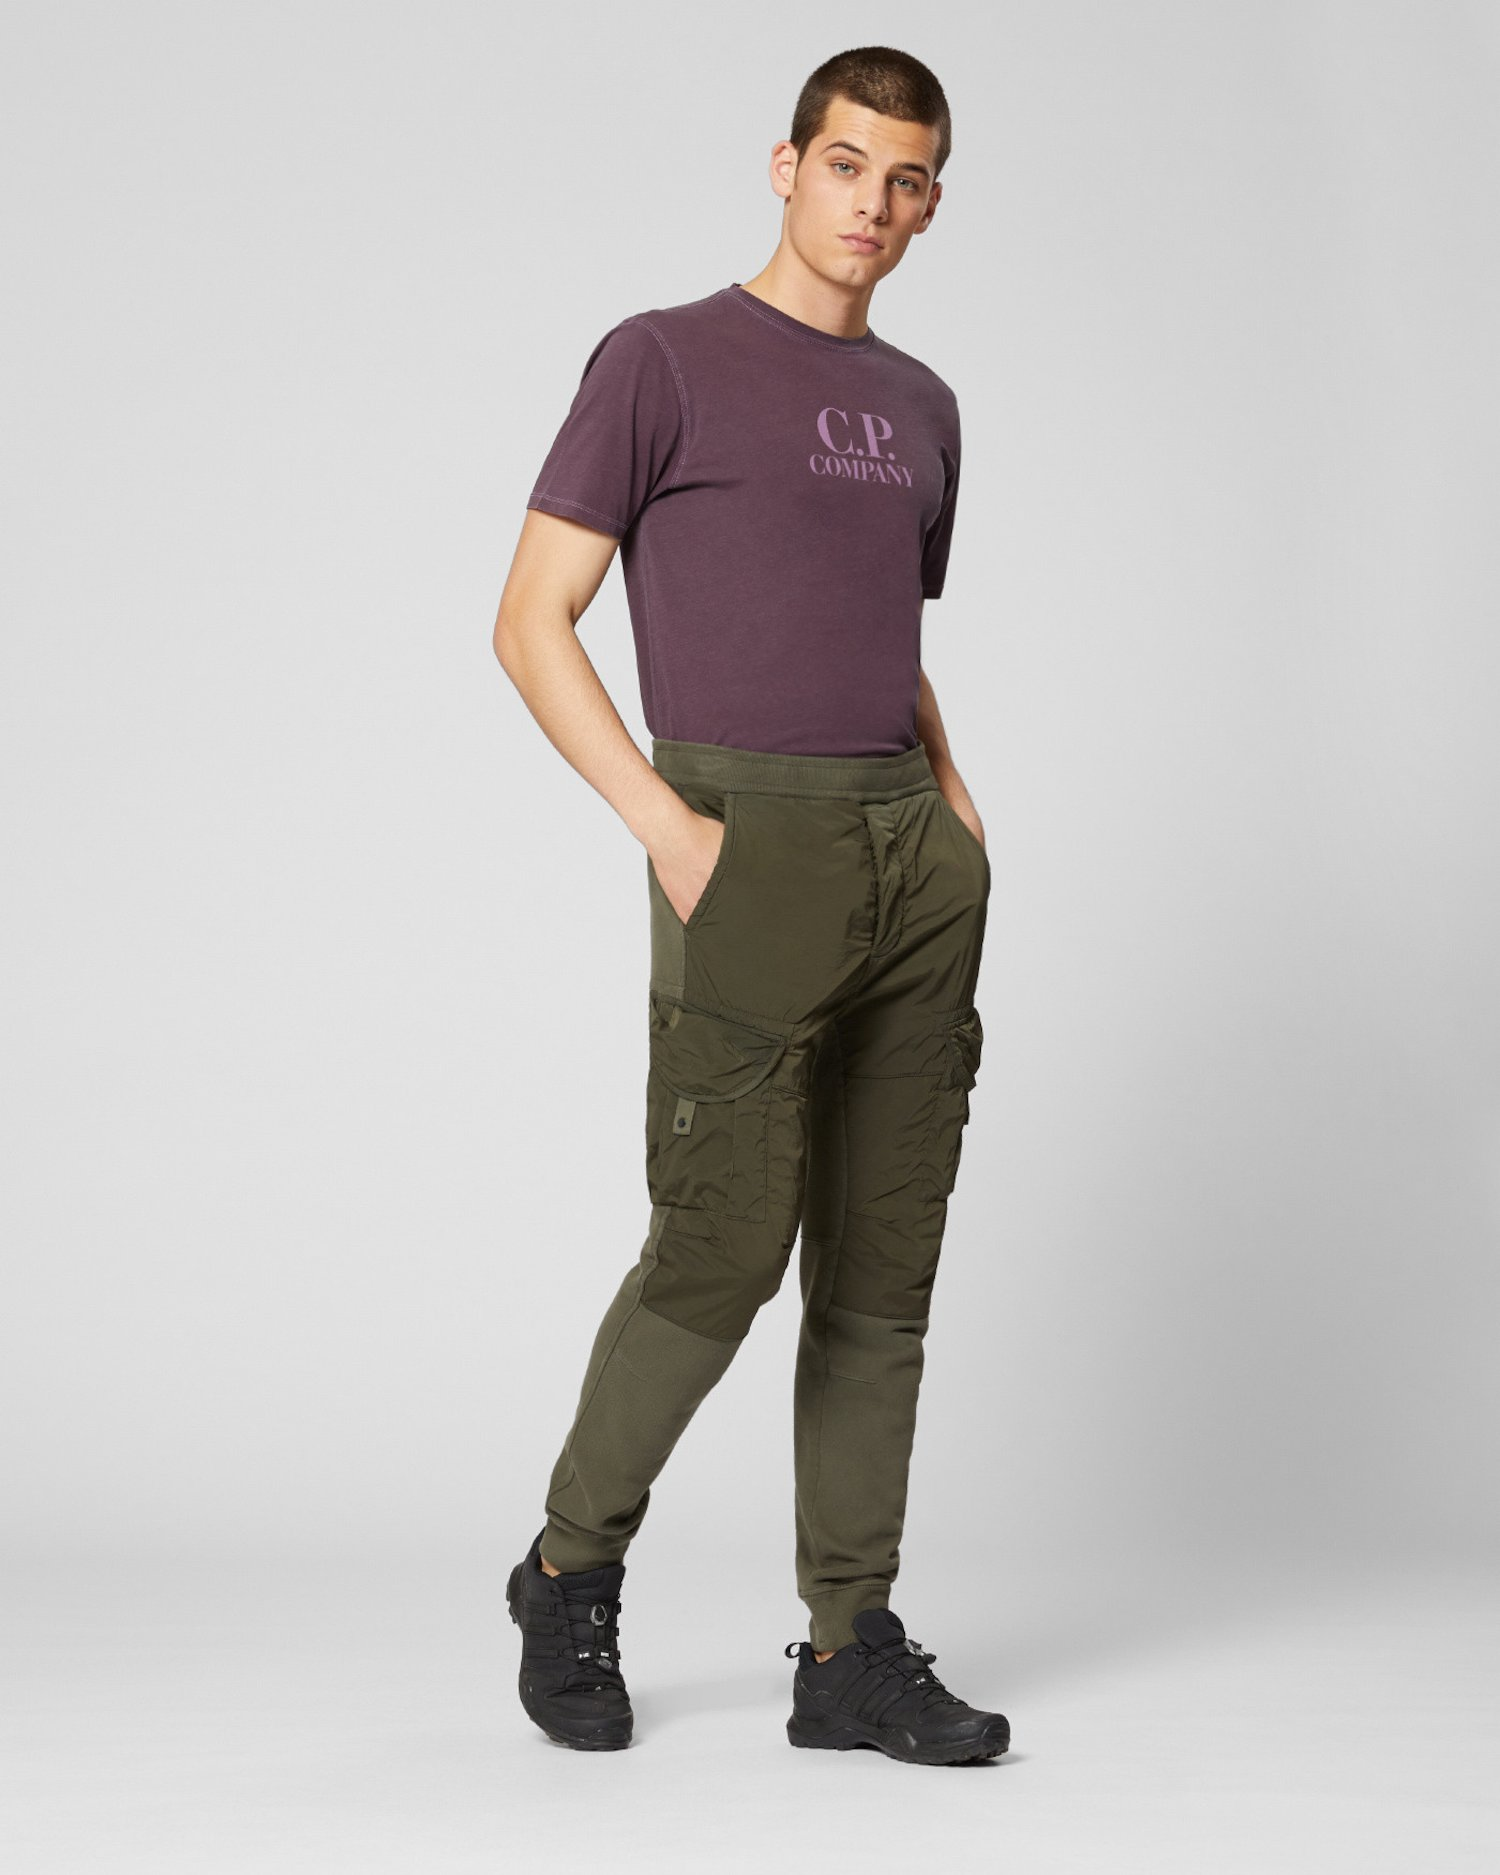 Brushed Fleece Mixed Garment Dyed Lens Sweat Pants